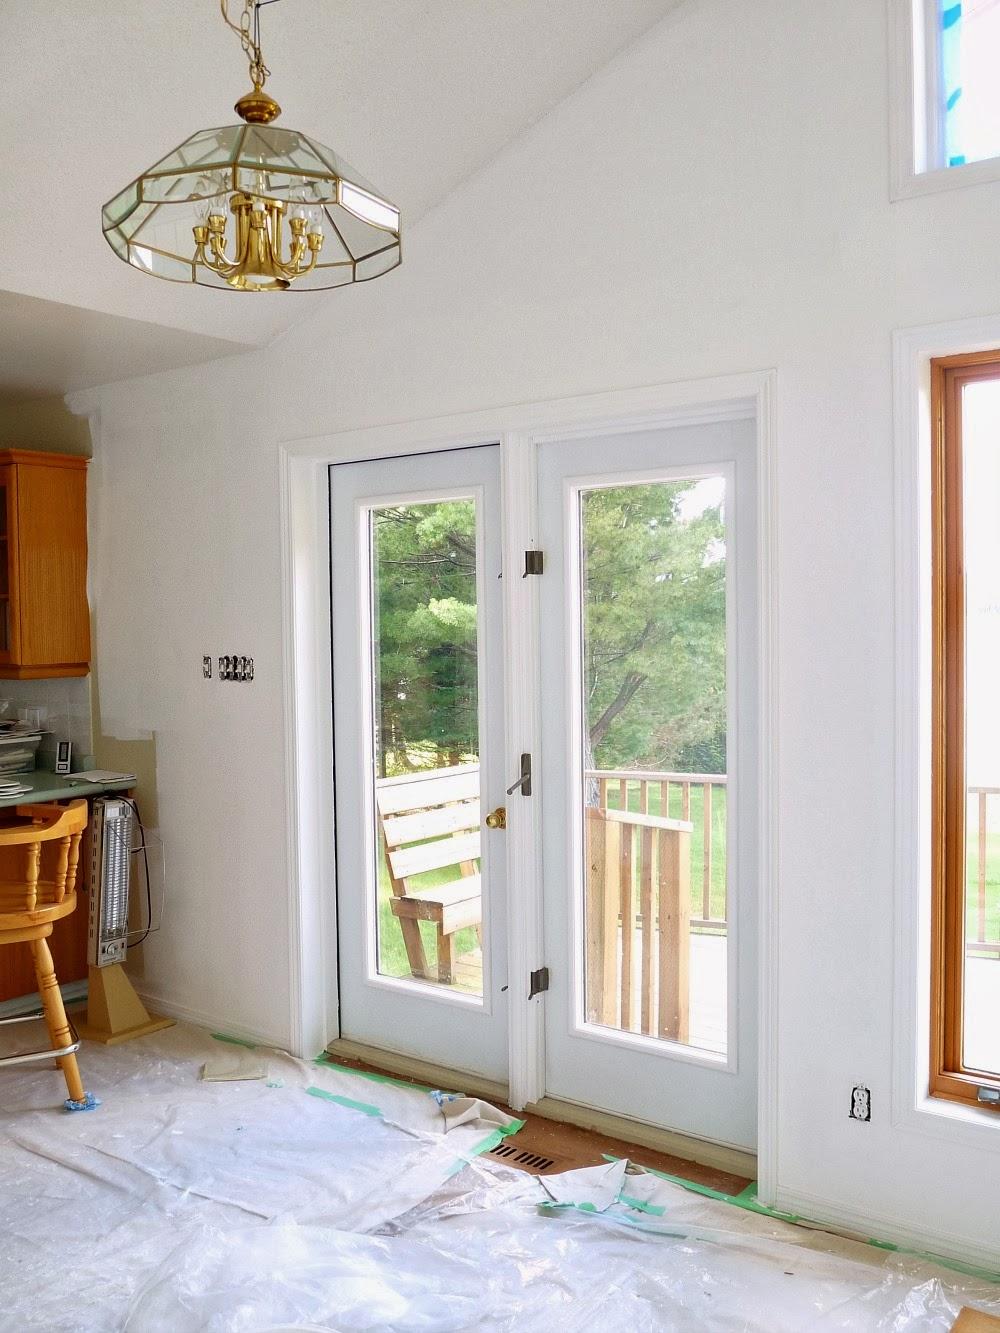 Paint door trim white